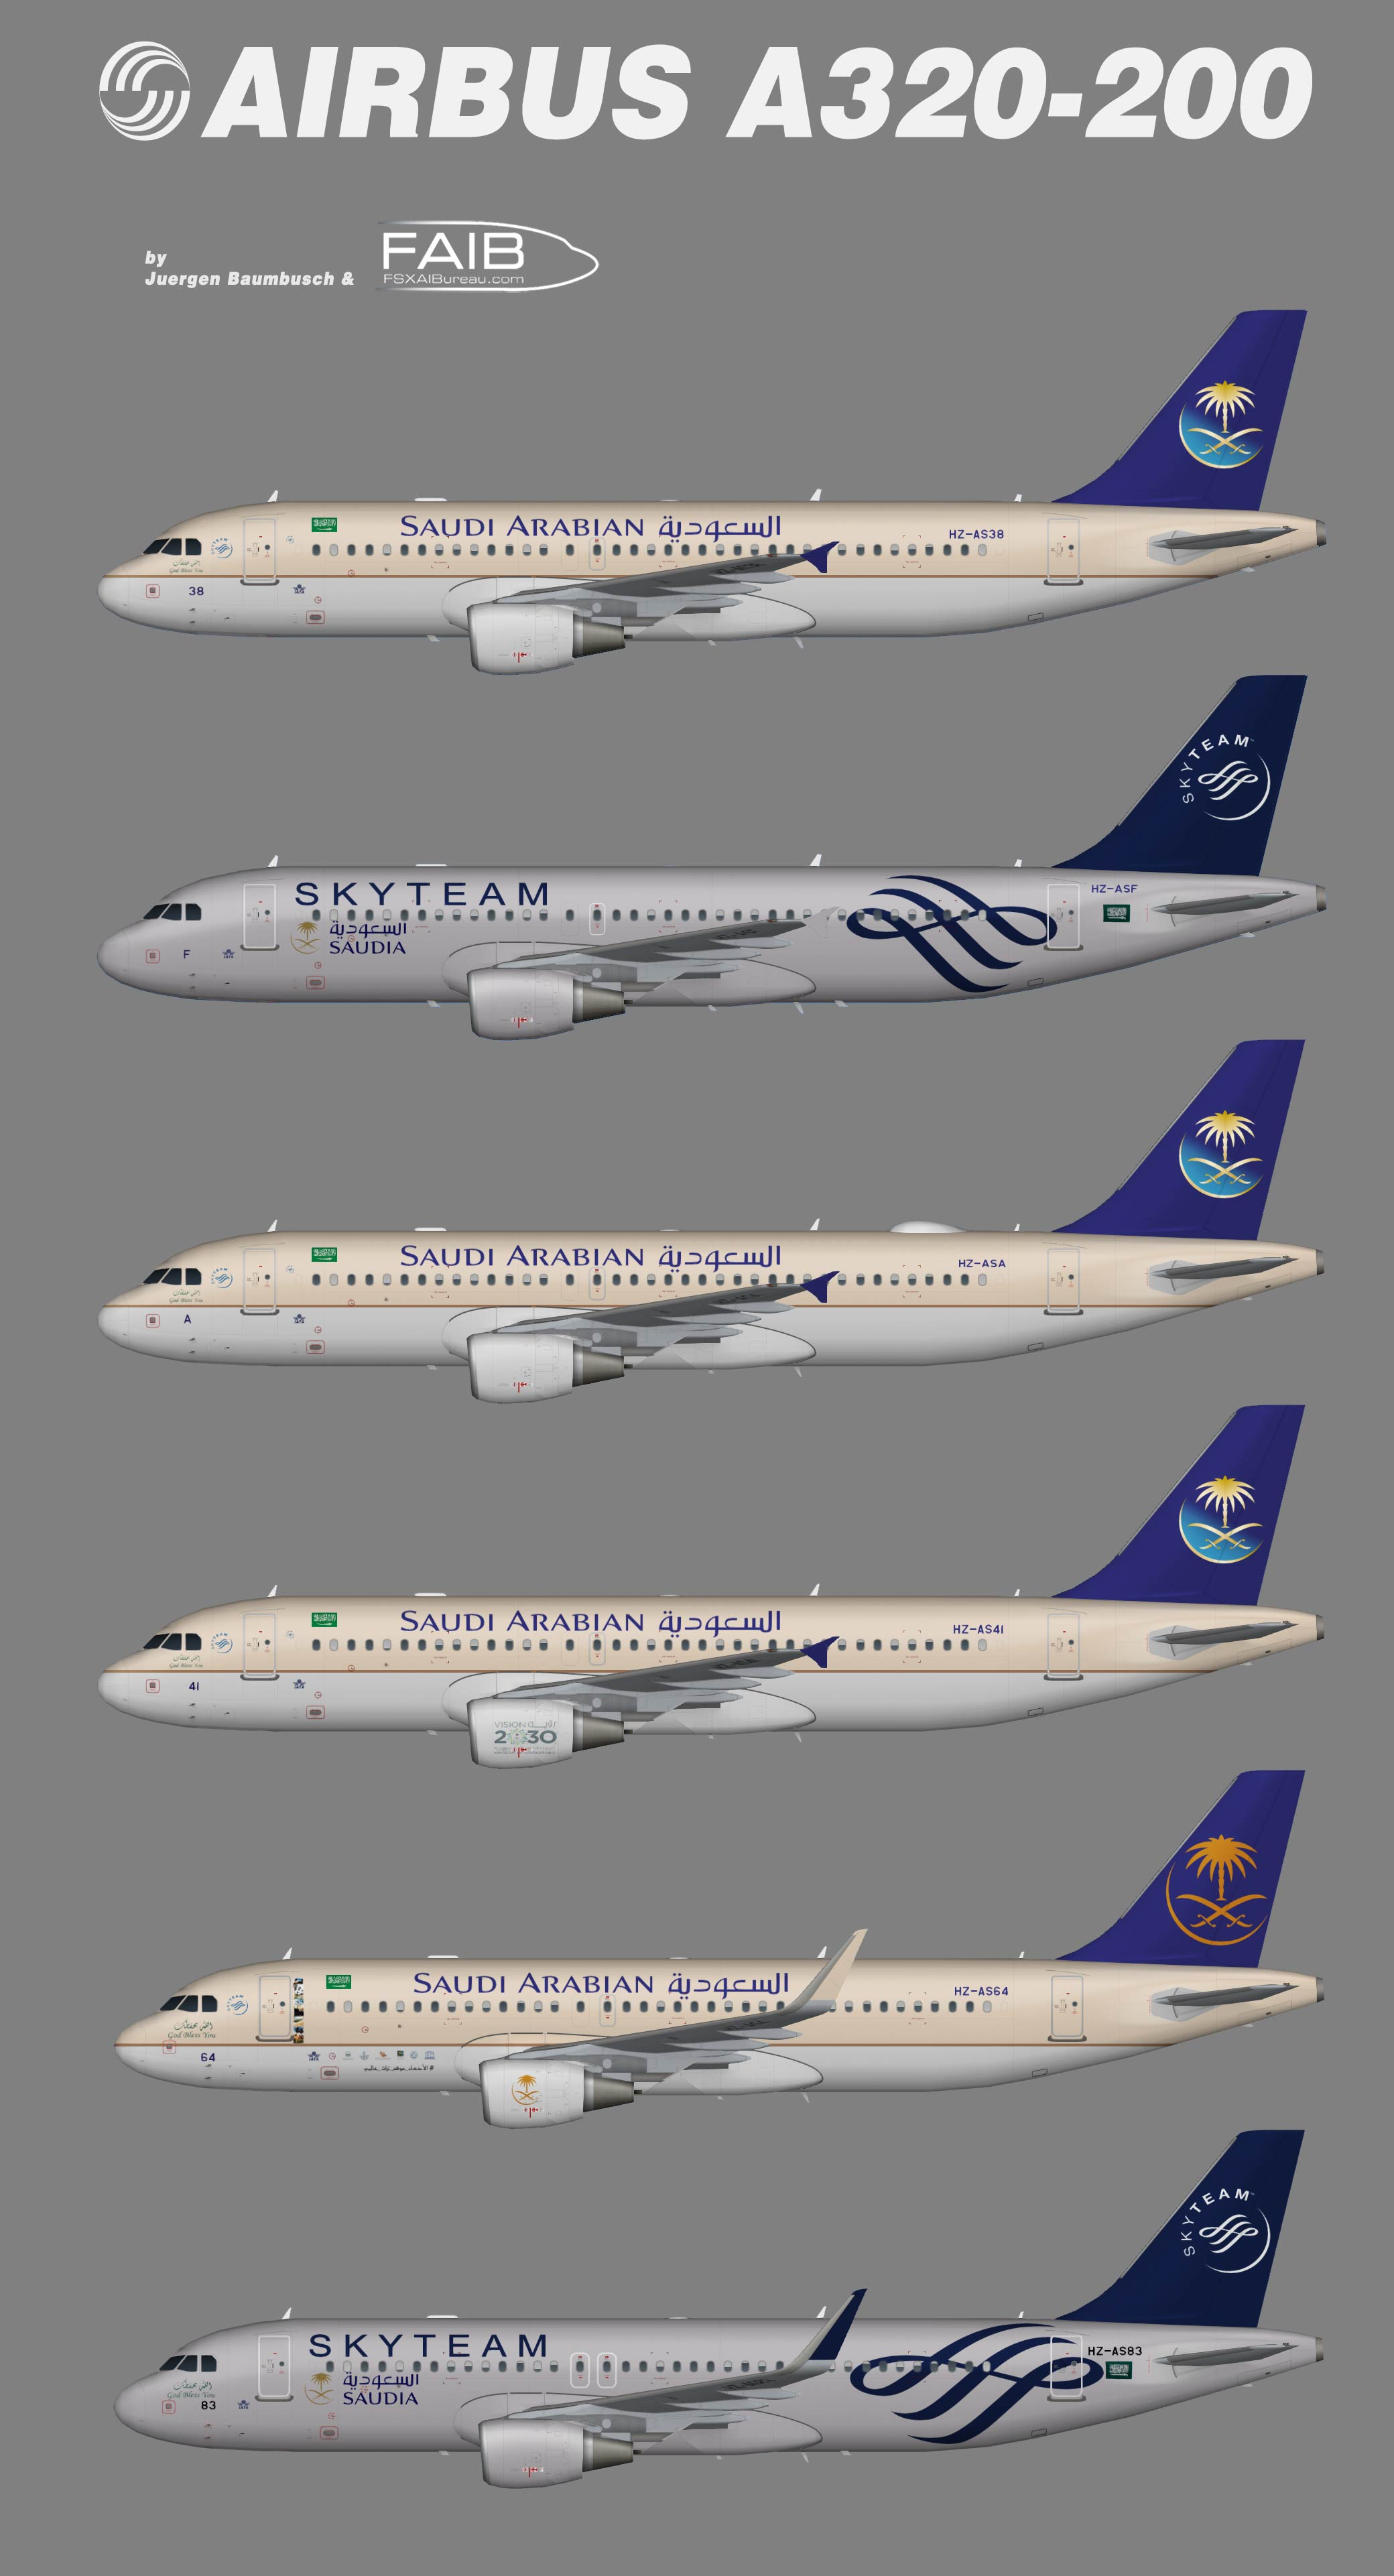 Saudia Airbus A320-200